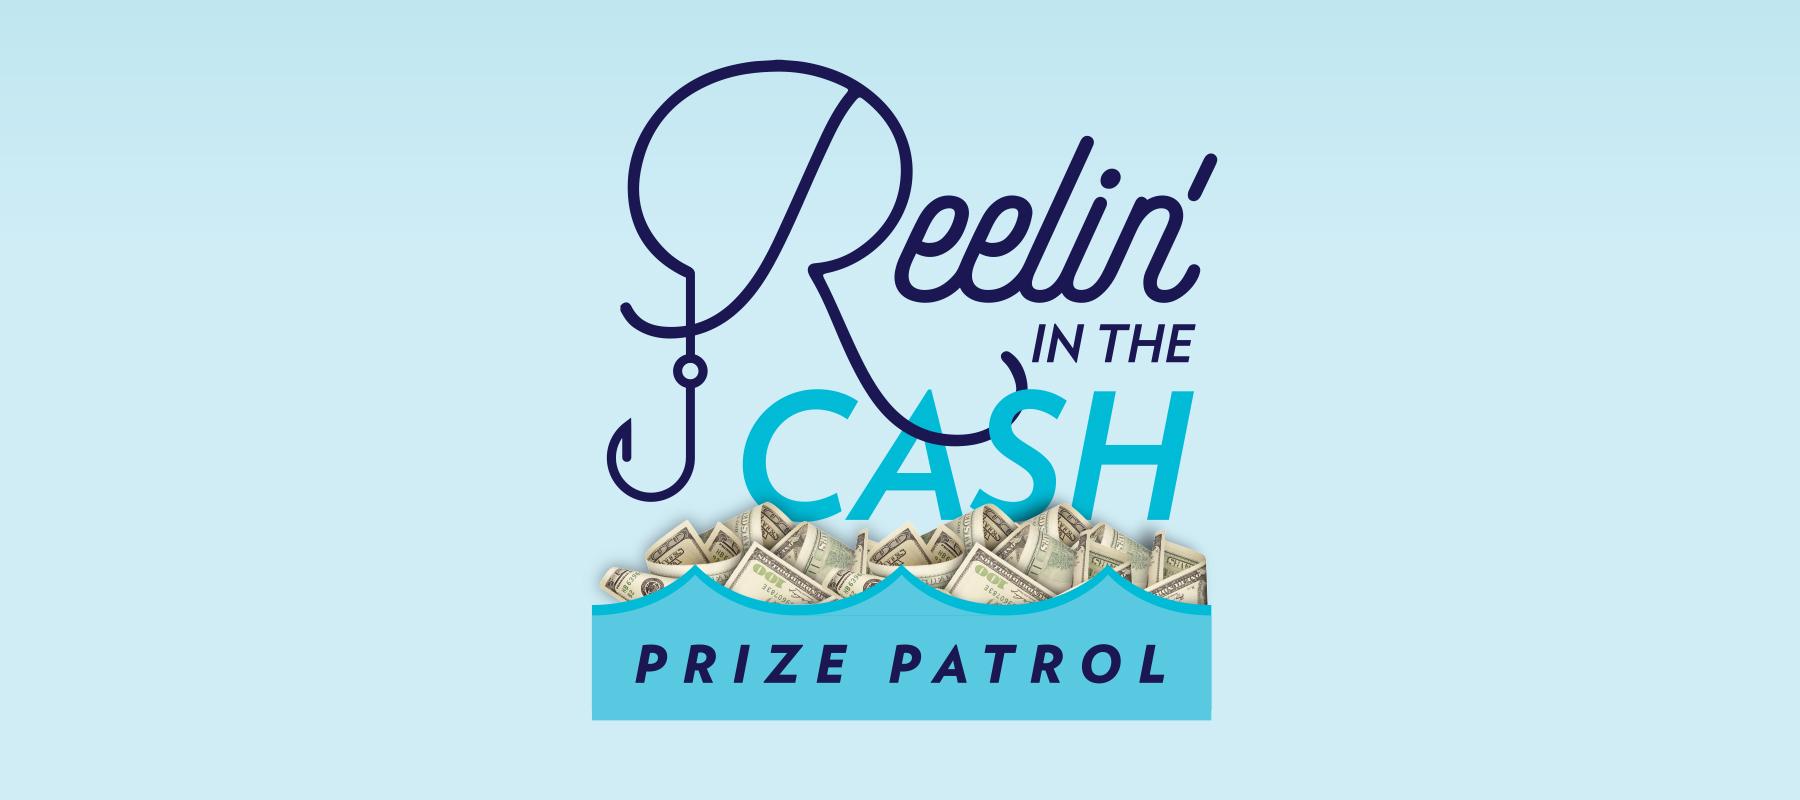 Reelin' in the Cash